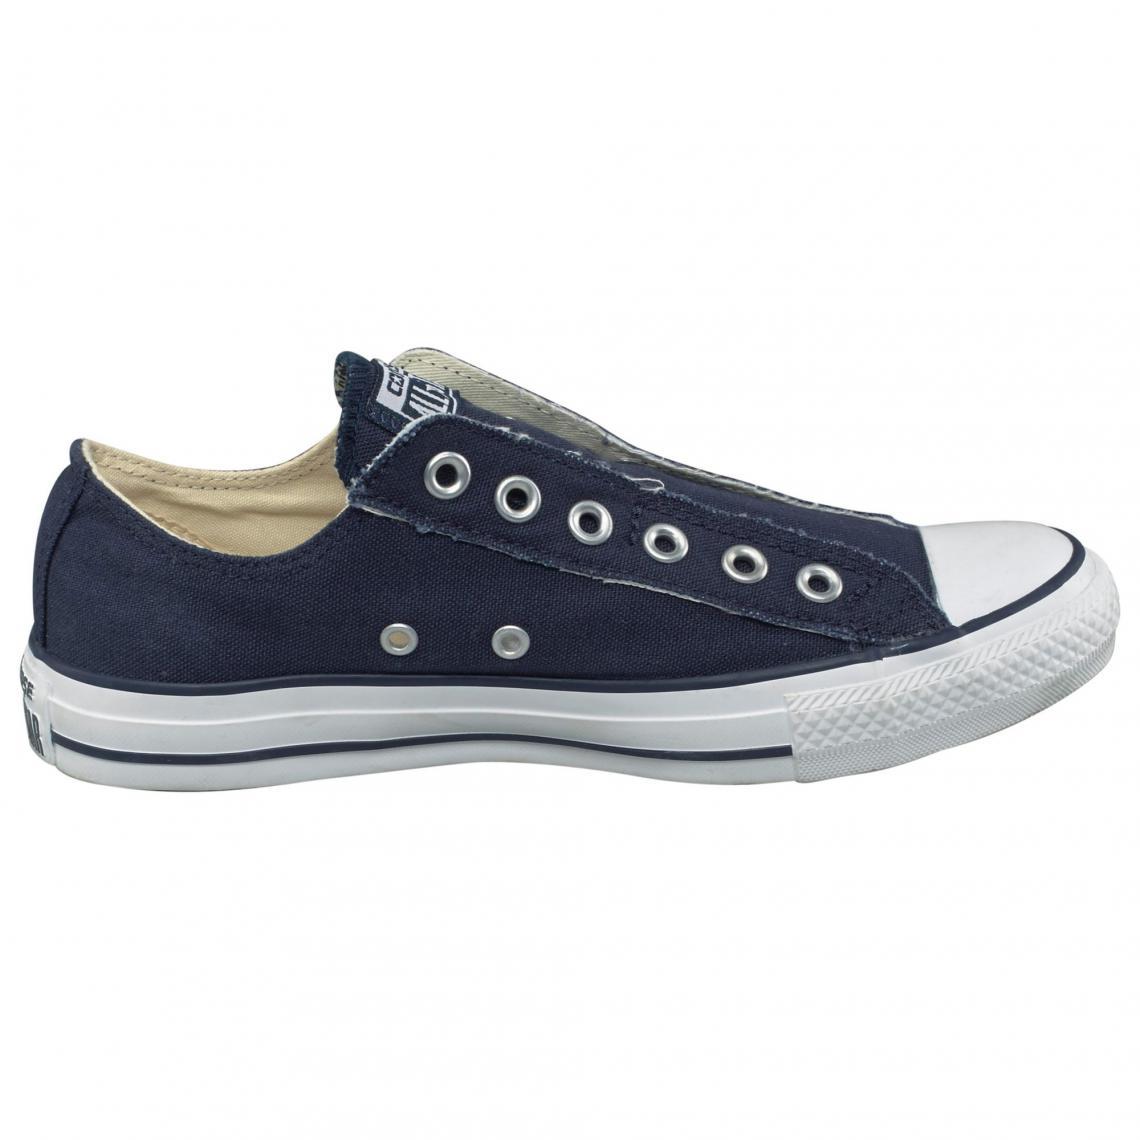 Homme Chaussures Converse Z %yqi Bleu Chuck Taylor All Star